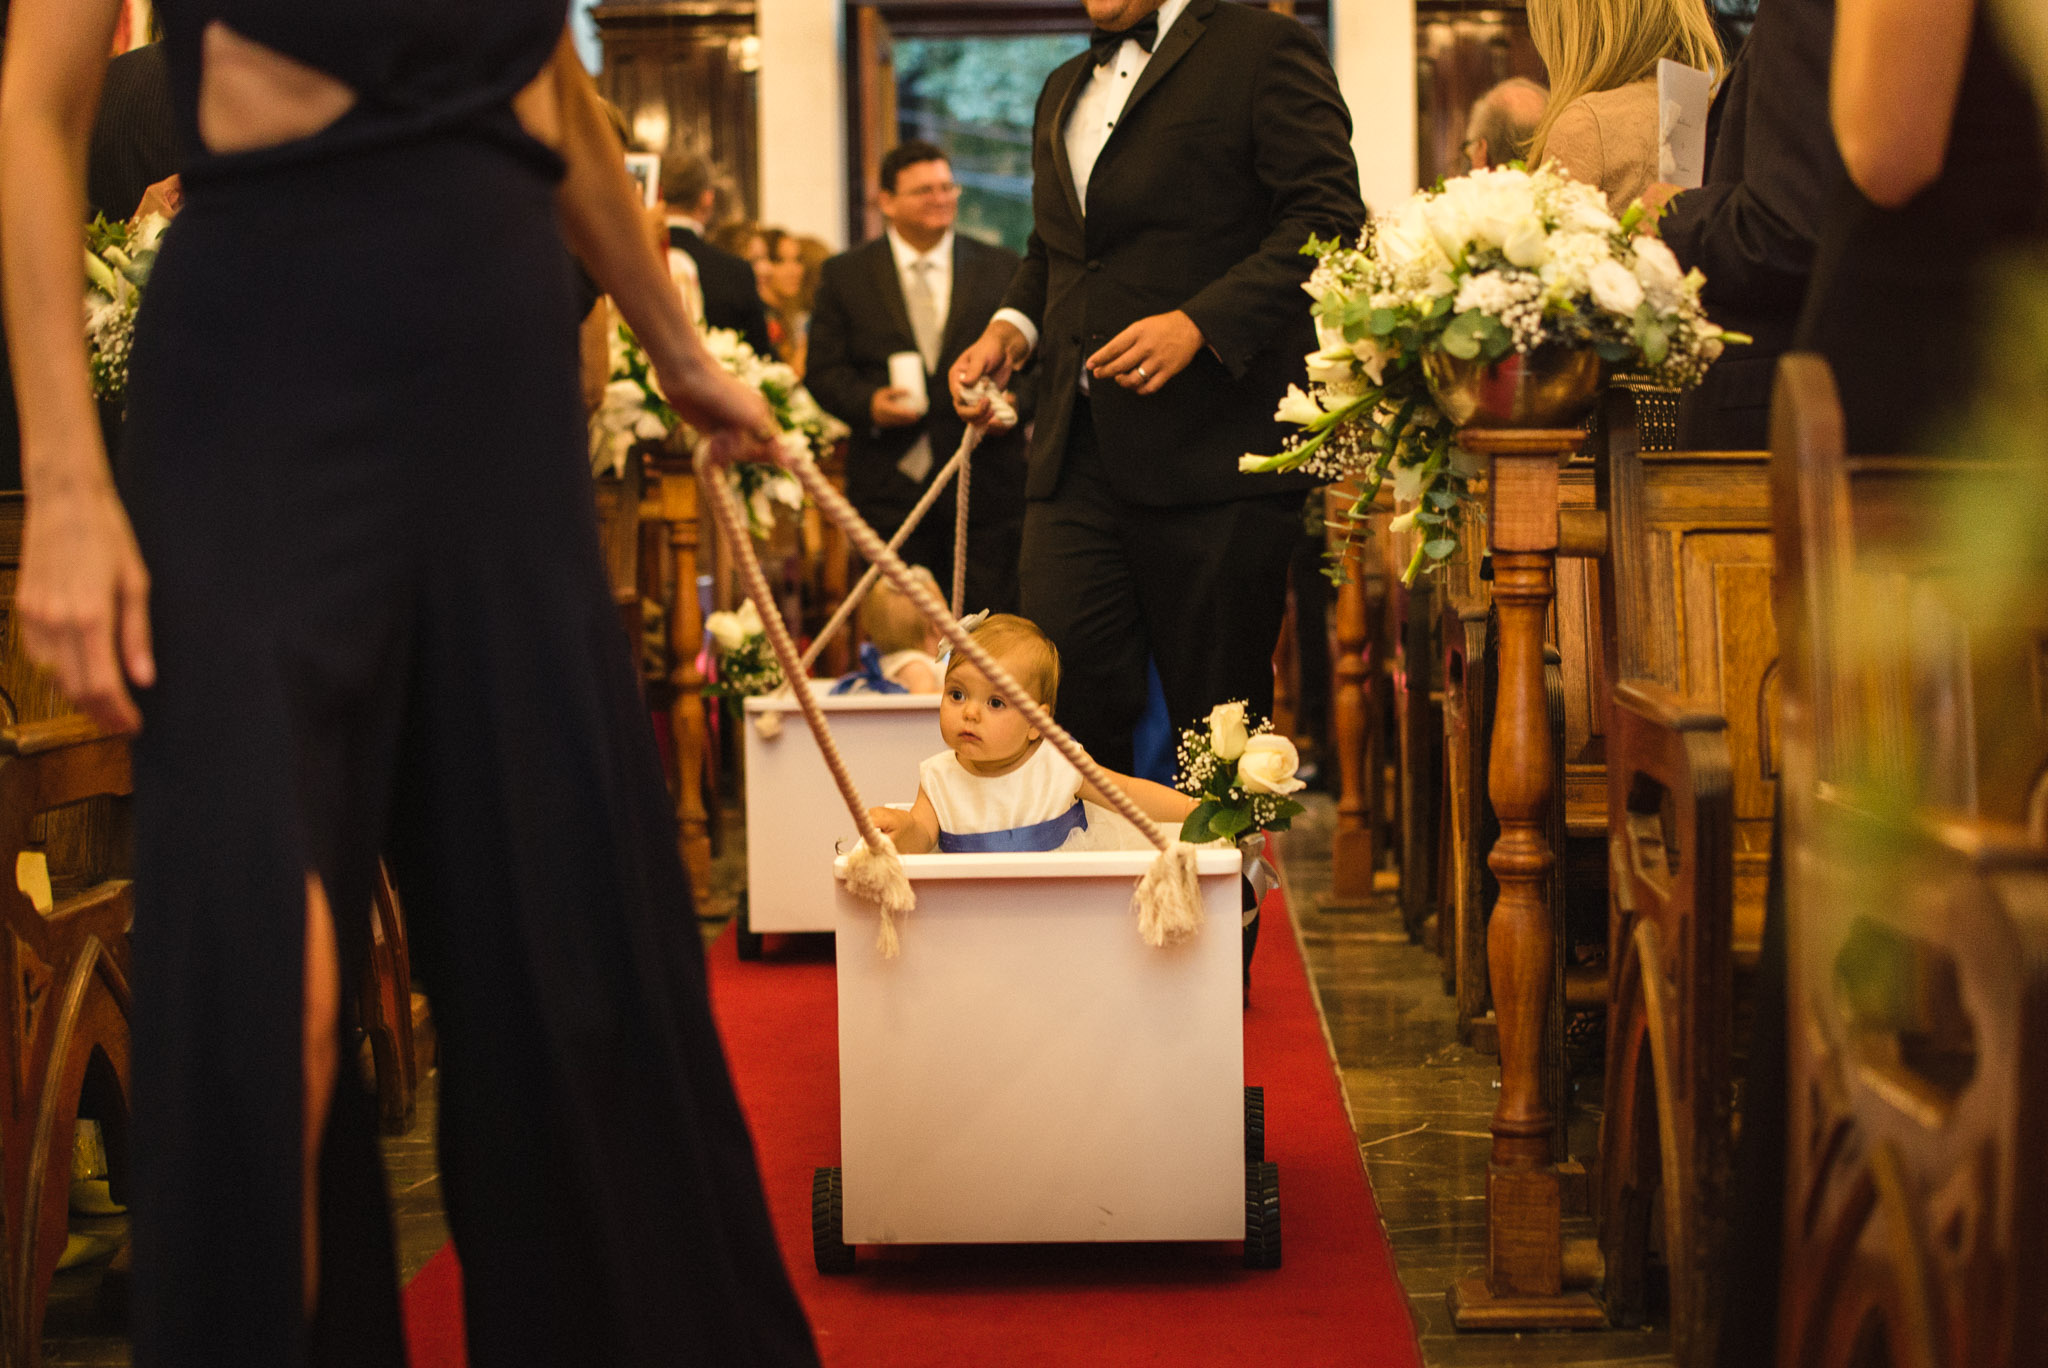 ©www.mauriziosolisbroca.com-20161001maurizio-solis-broca-mexico-canada-wedding-photographer20161001DSC07146-2-Edit.jpg